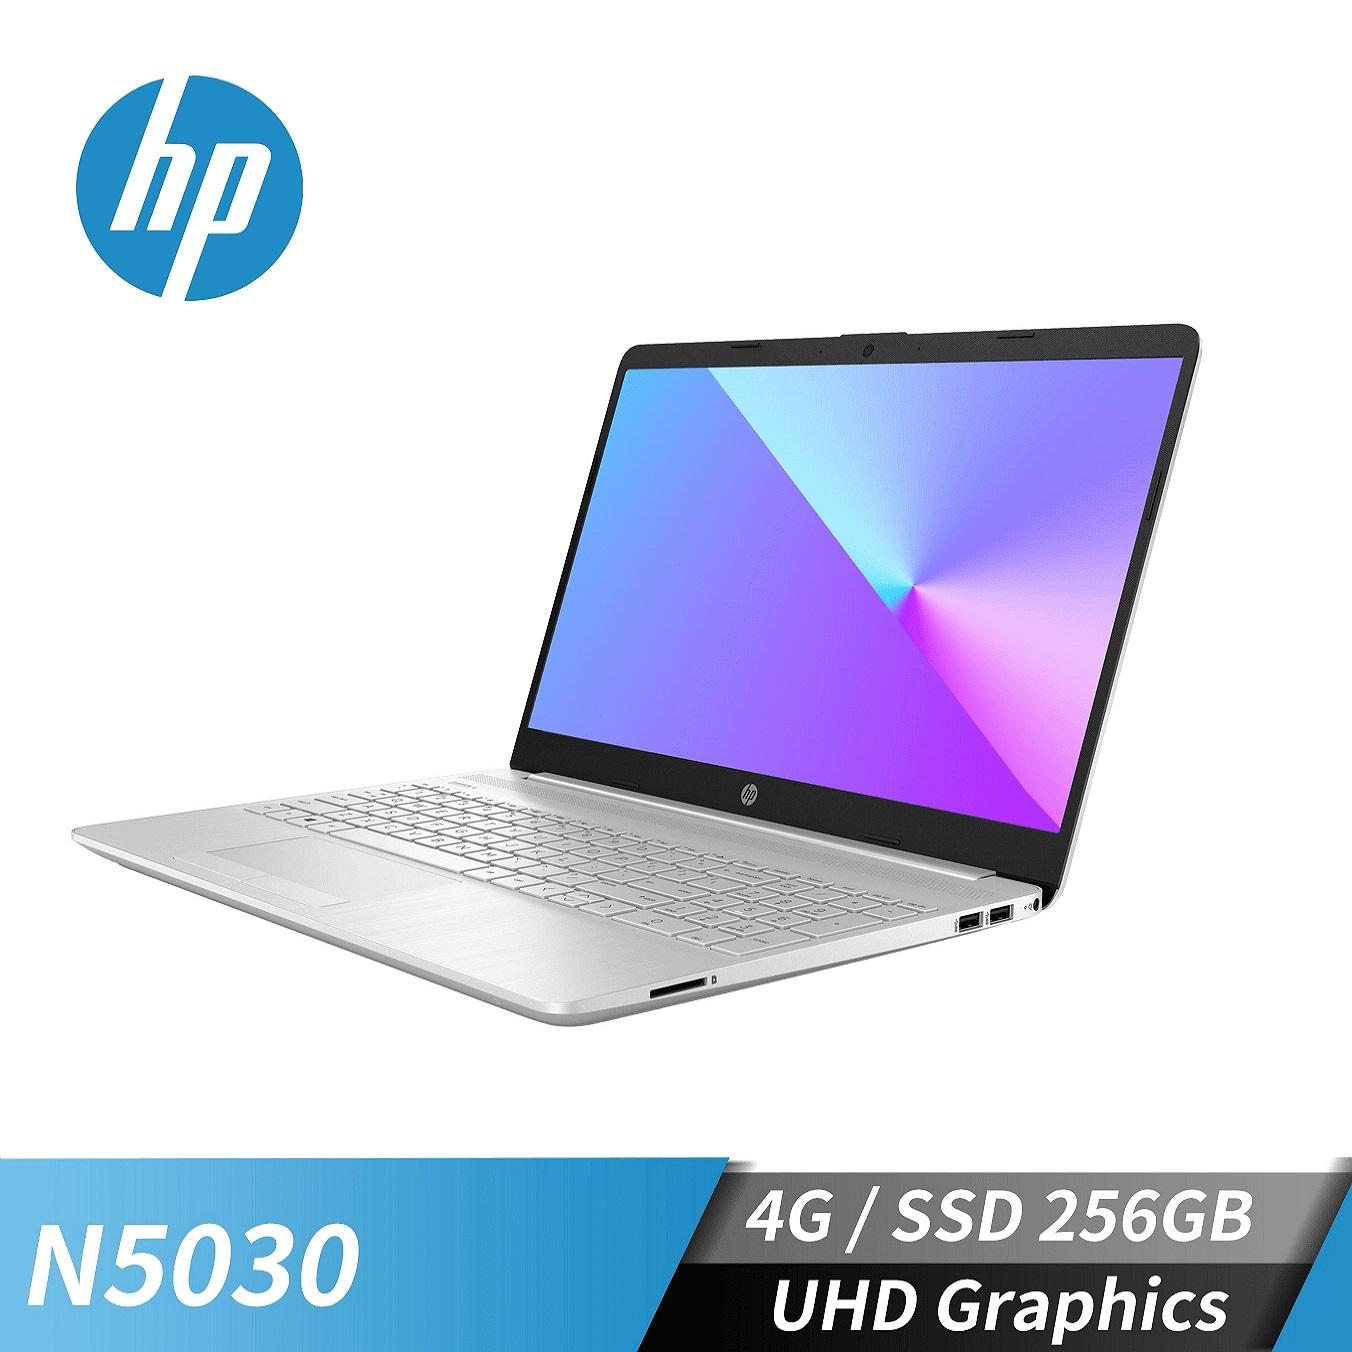 HP惠普 超品15s 筆記型電腦(N5030/UHD Graphics/4GB/256GB)